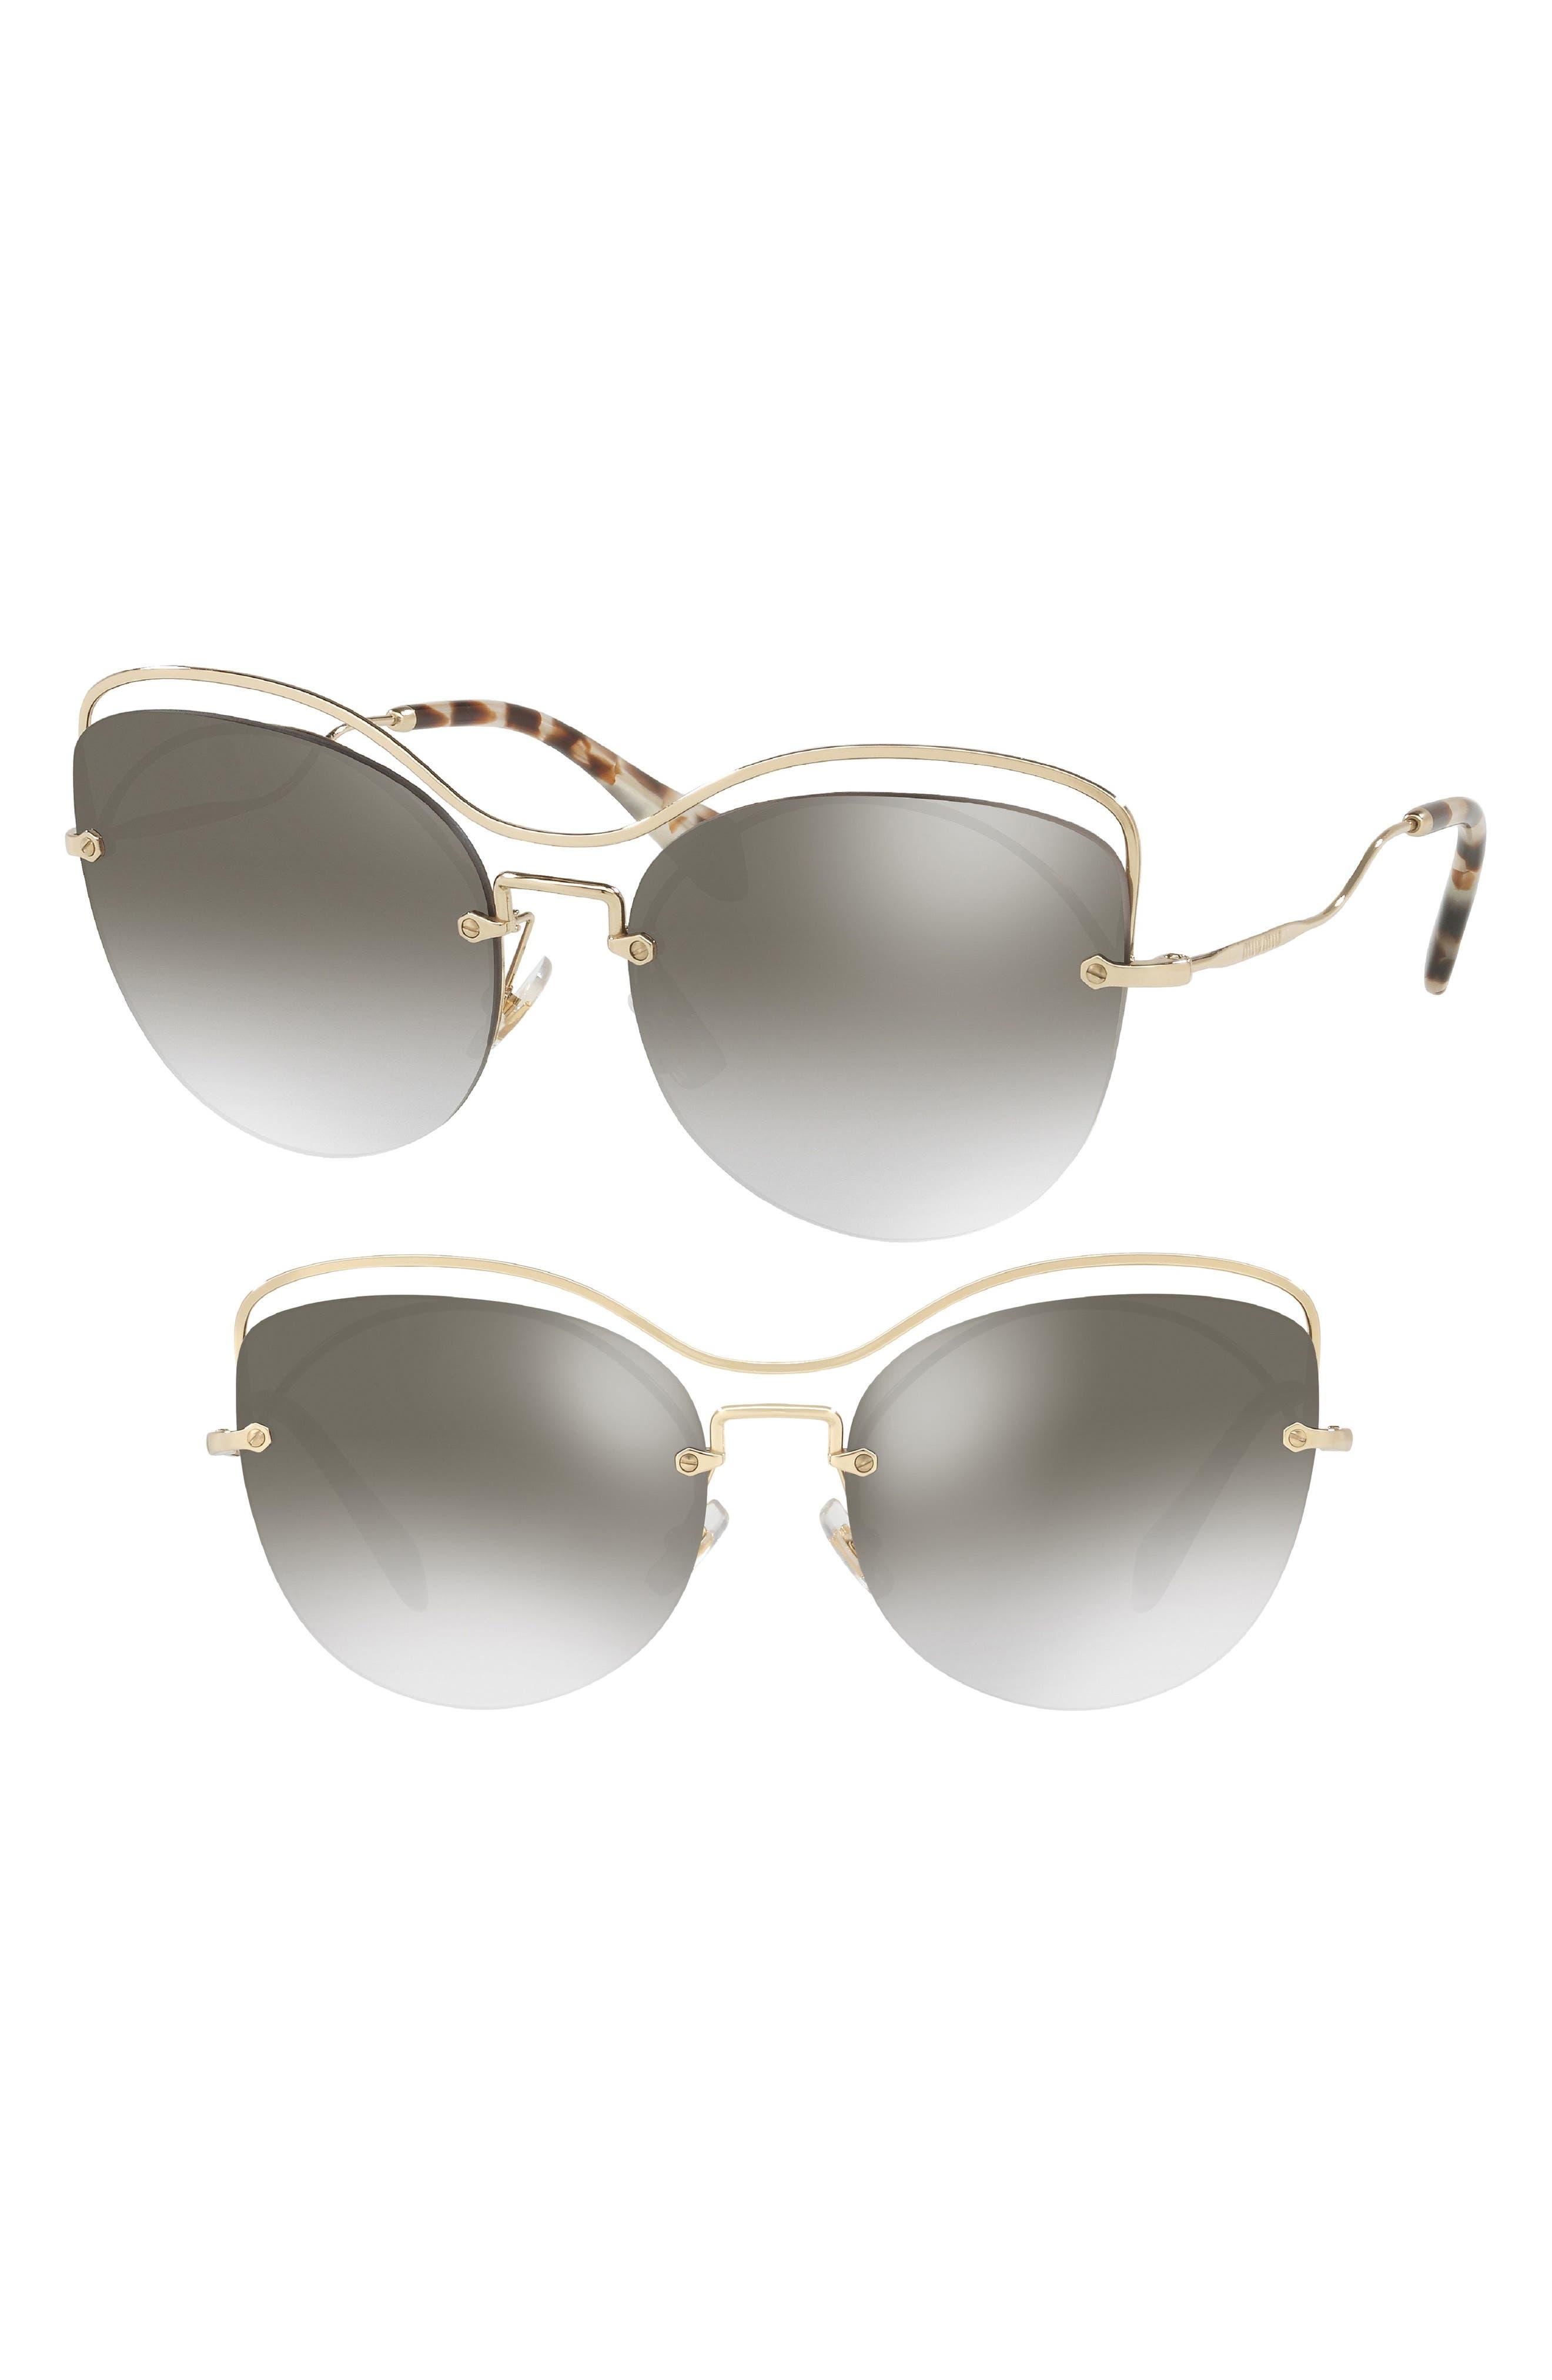 Miu Miu 60mm Mirrored Cat Eye Sunglasses